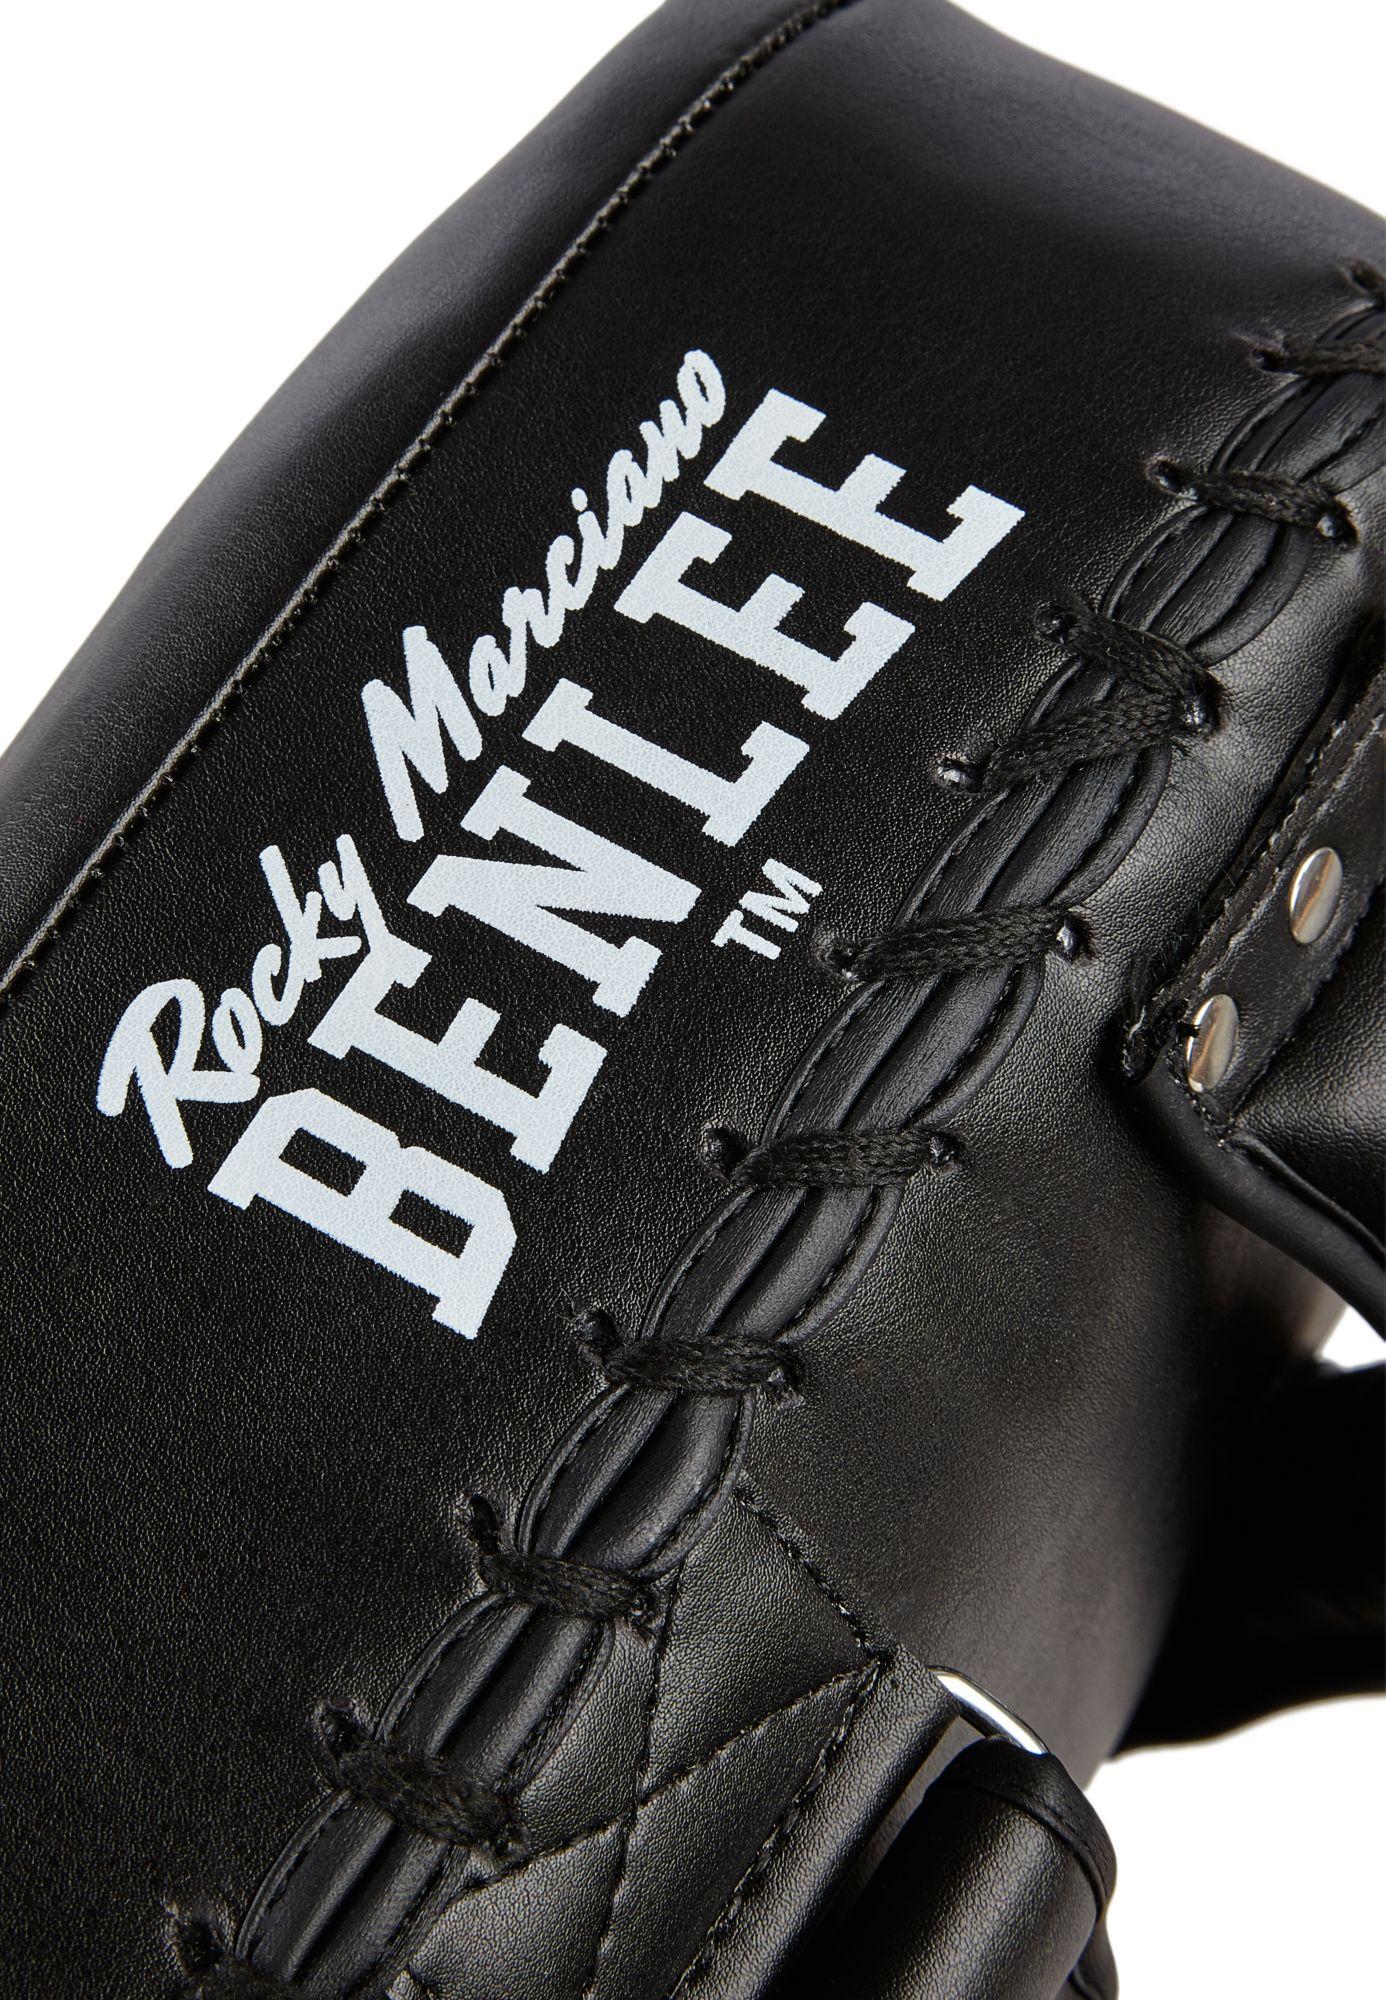 BENLEE ROCKY MARCIANO Benlee Rocky Marciano Pratzen »RAGE Pair«